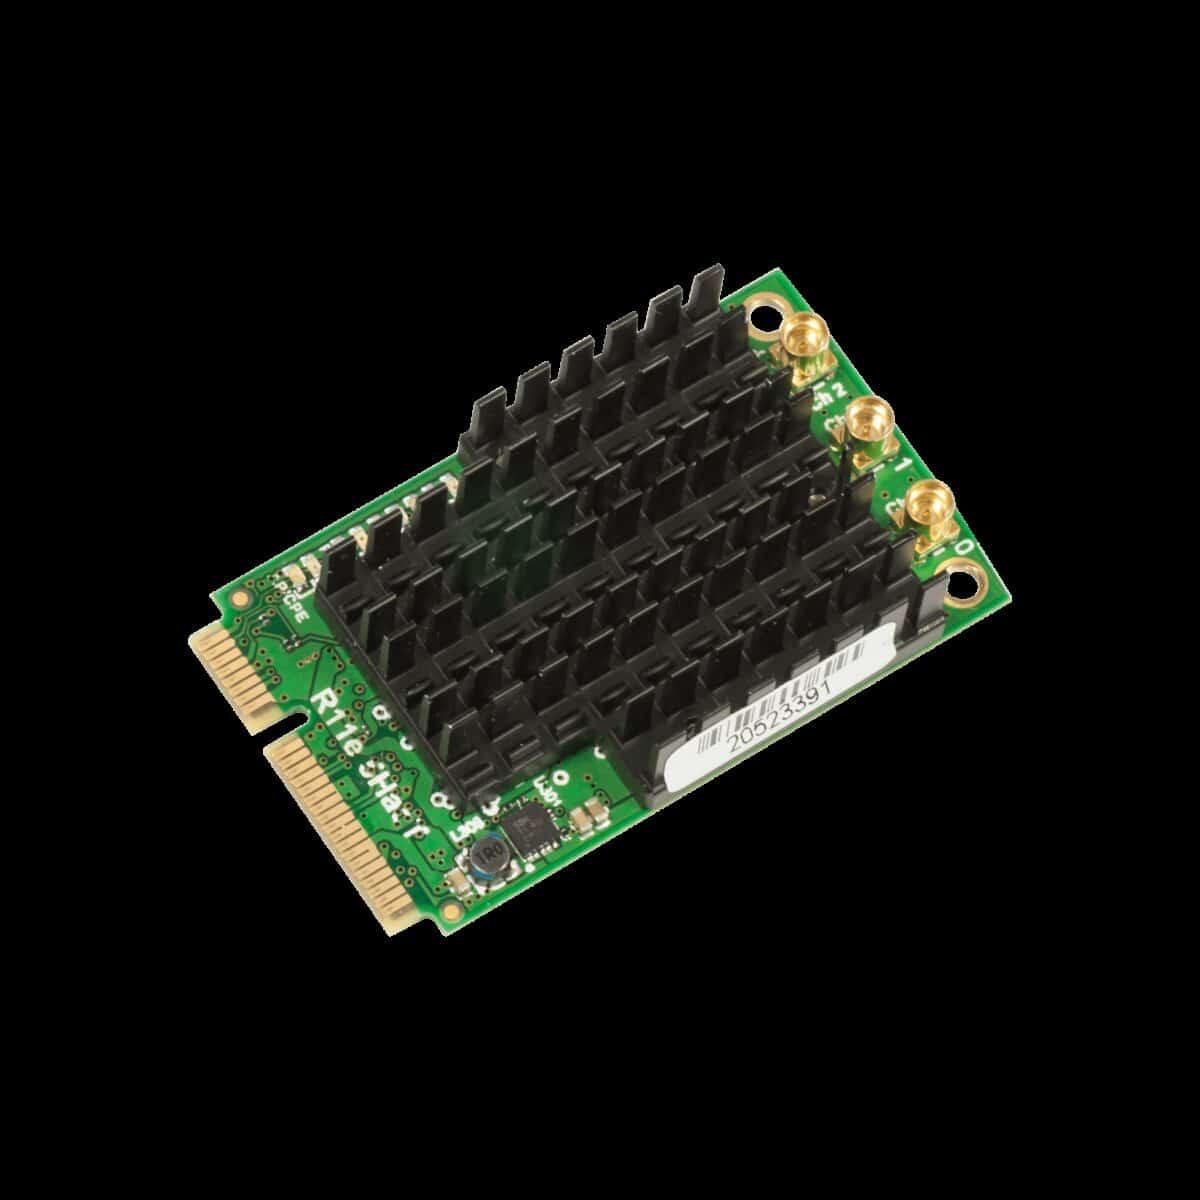 MikroTik R11e-5HacD - 5 GHz miniPCI-e card